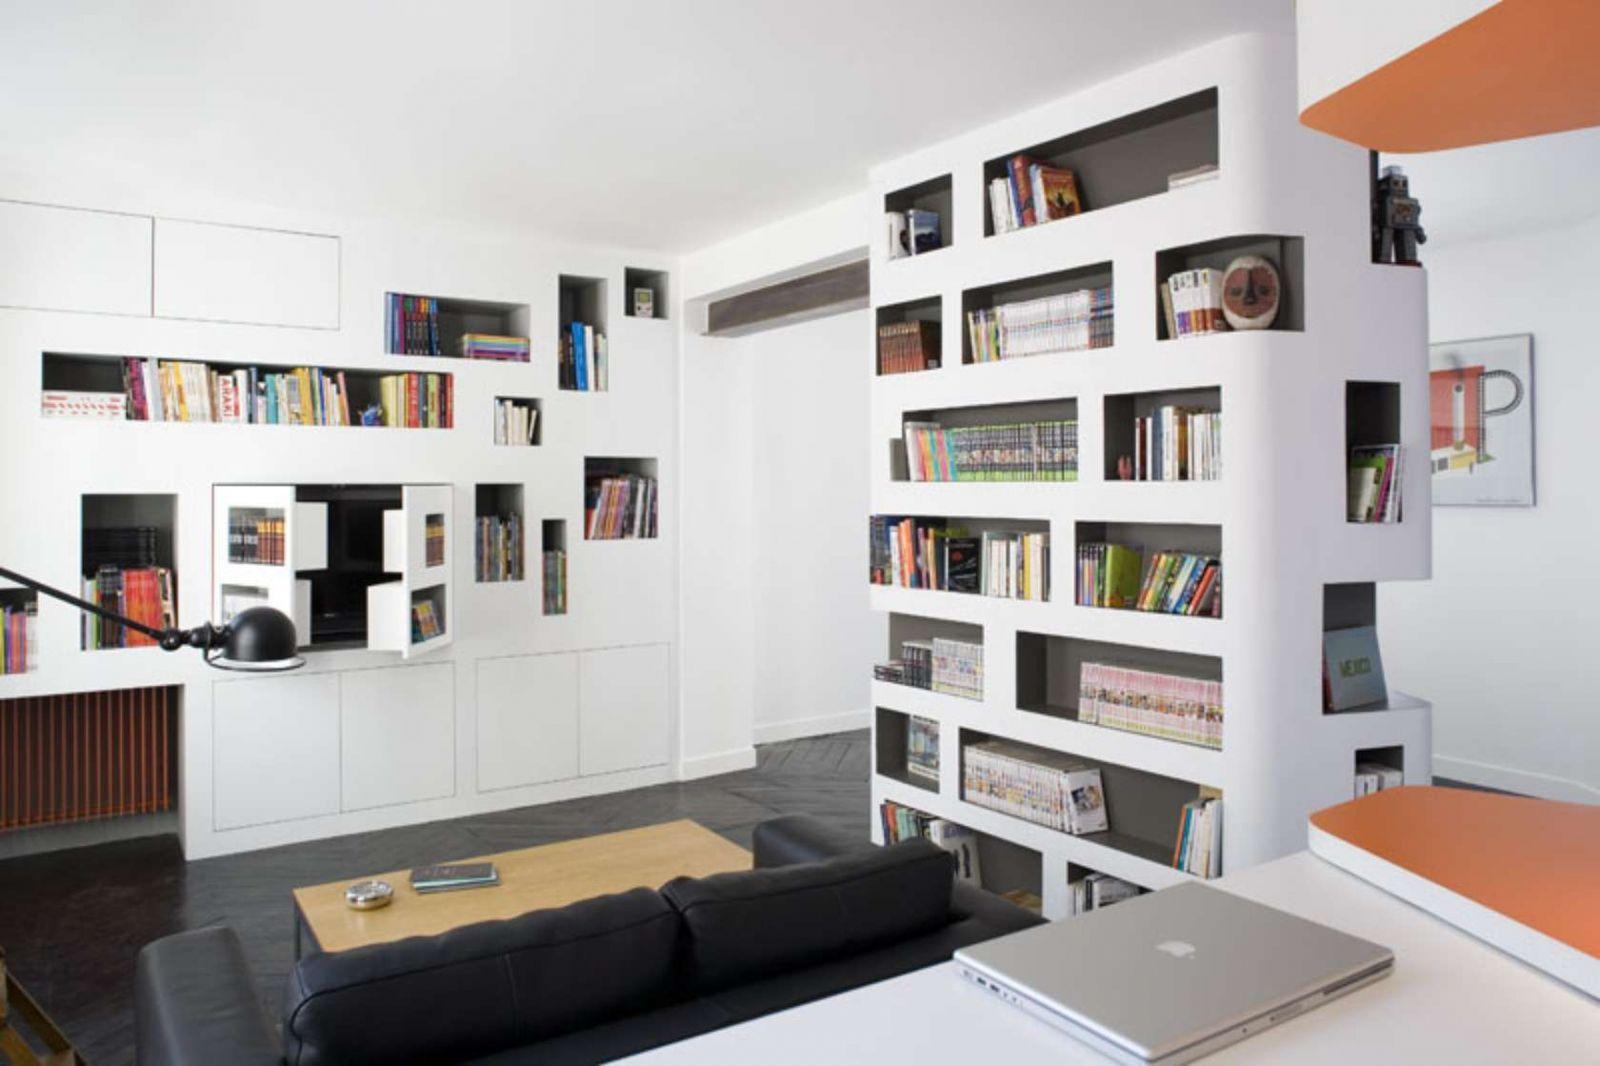 Osve ite dnevnu sobu uz mini bud et 10 ideja koje ete for Decorating ideas for living room wall niche